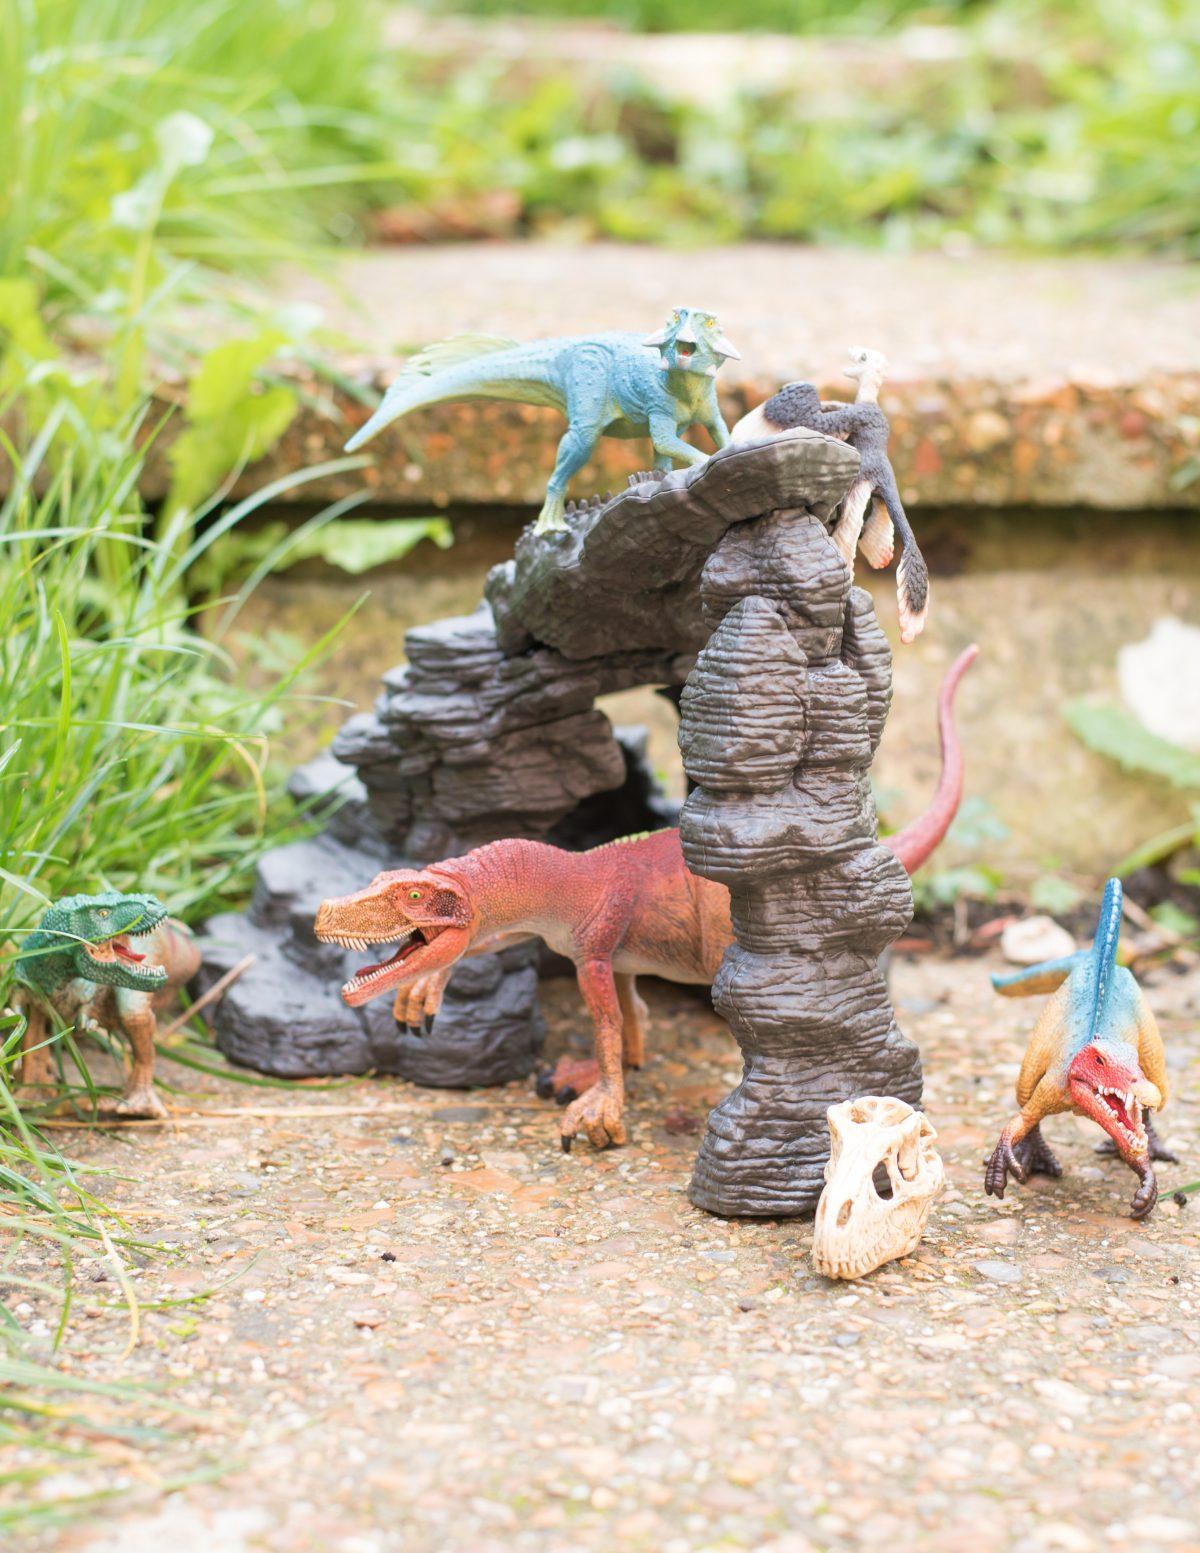 Schleich Dinosaurs Cave Set in the Garden free play dinovember